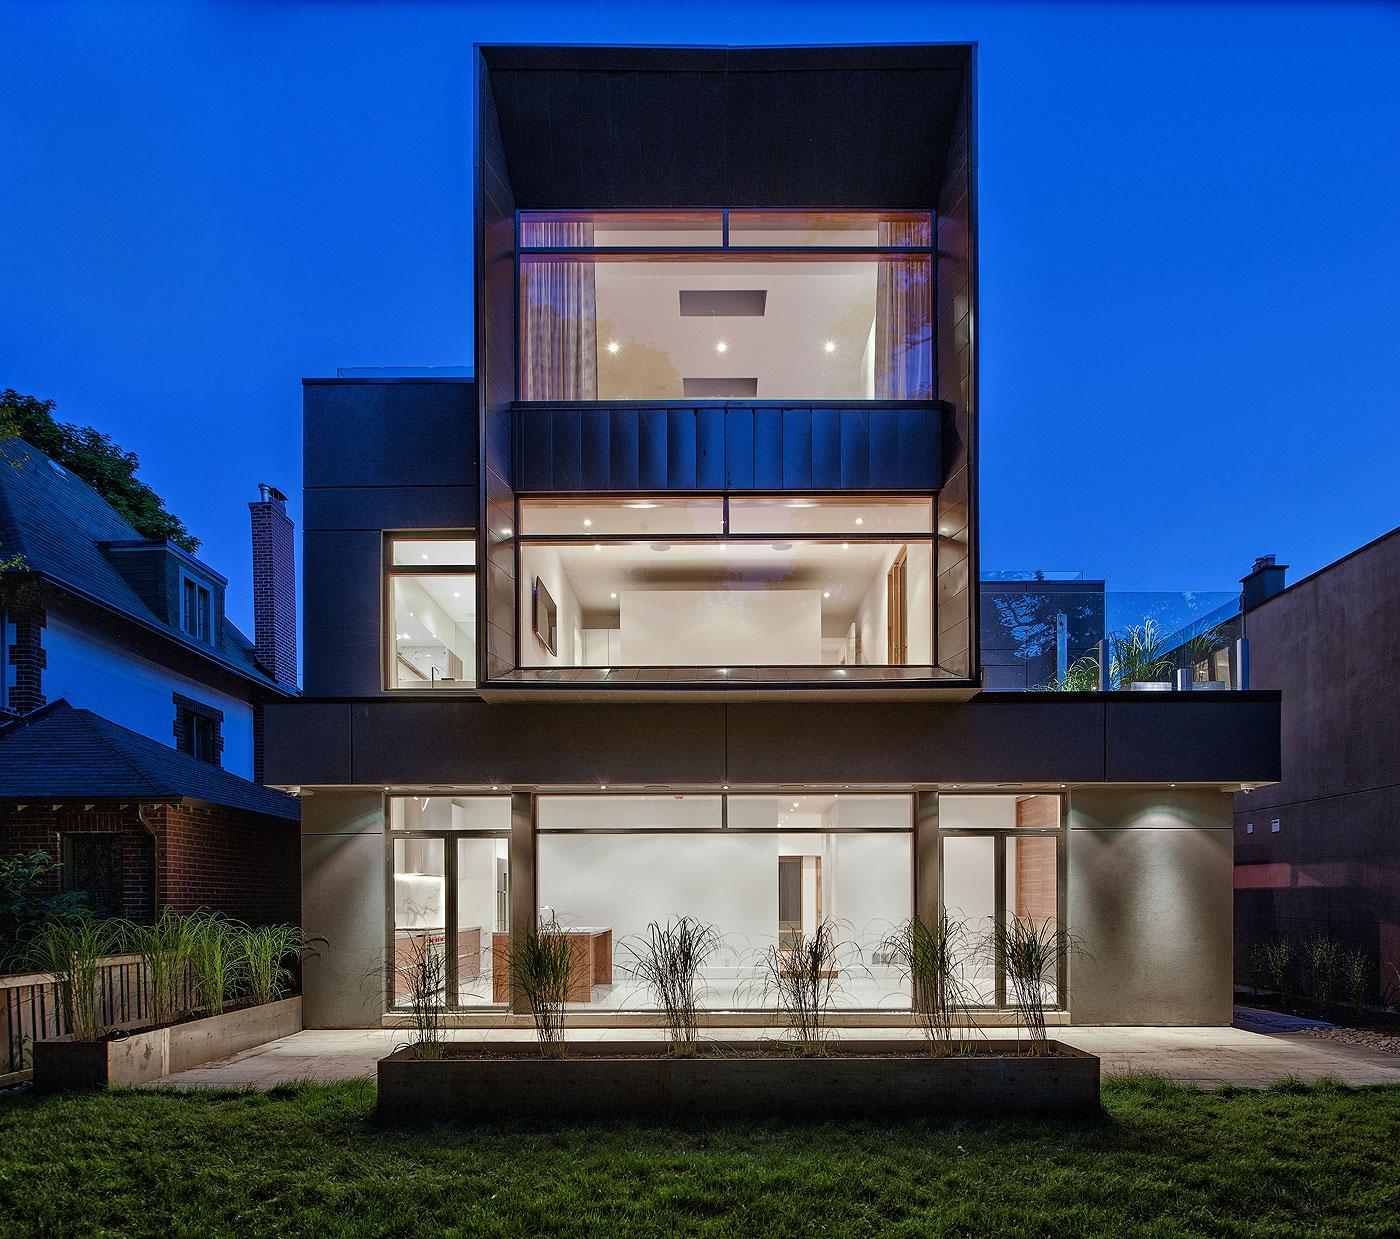 residencia-heathdale-tact-architecture-design (14)